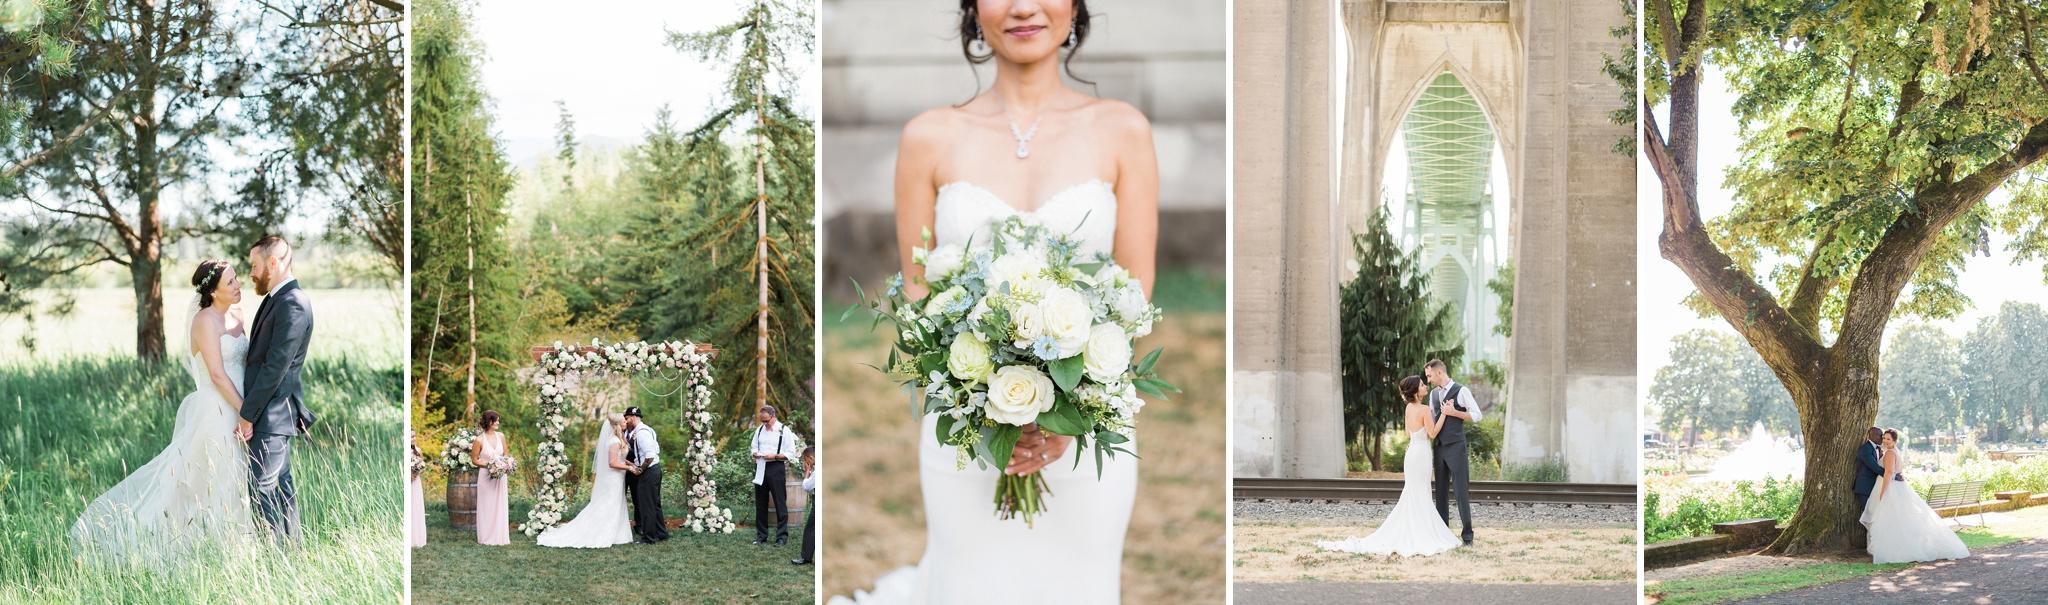 black-butte-ranch-oregon-wedding-shelley-marie-photo.jpg